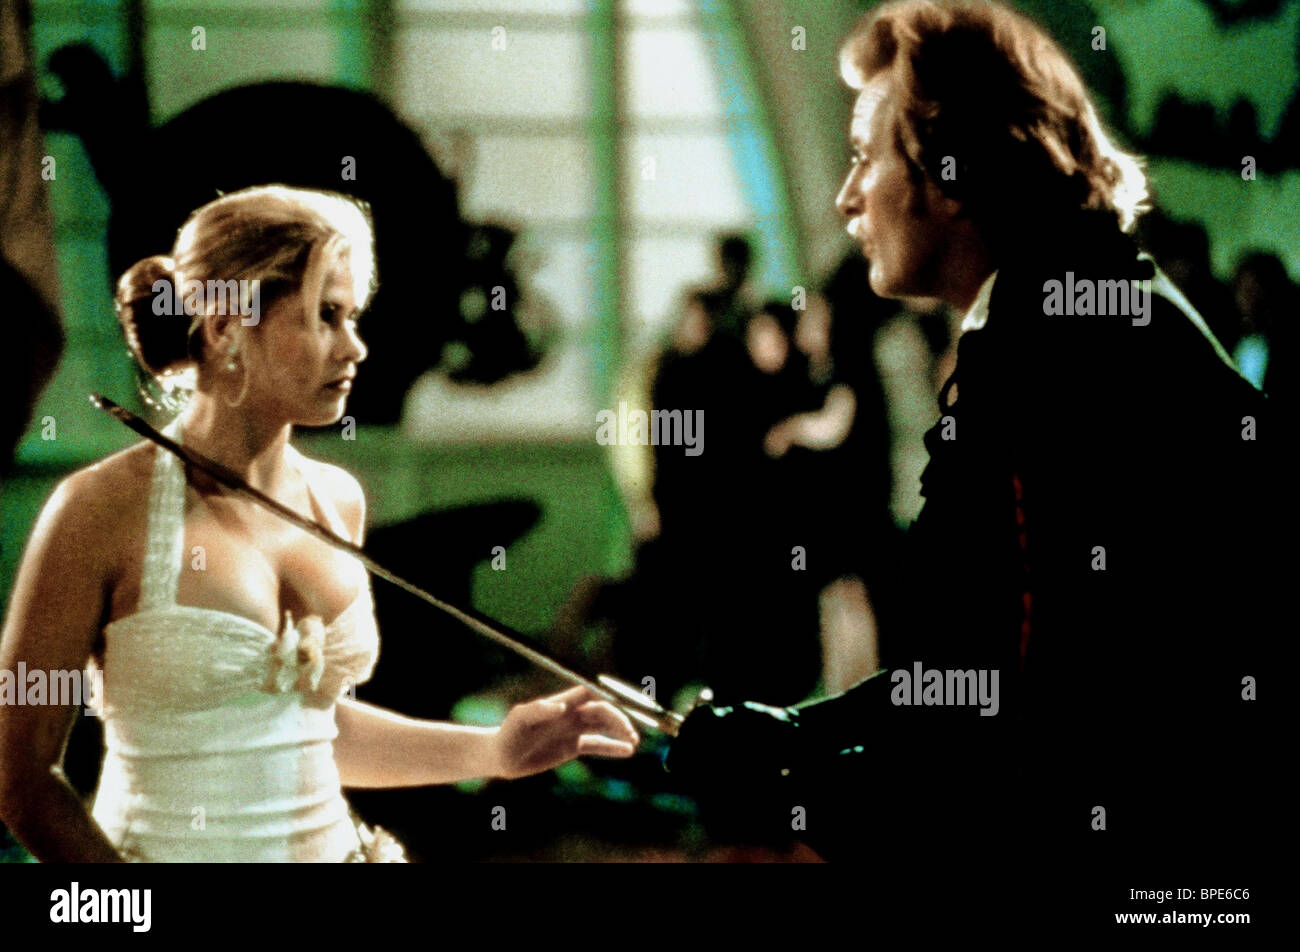 KRISTY SWANSON RUTGER HAUER BUFFY THE VAMPIRE SLAYER (1992) - Stock Image